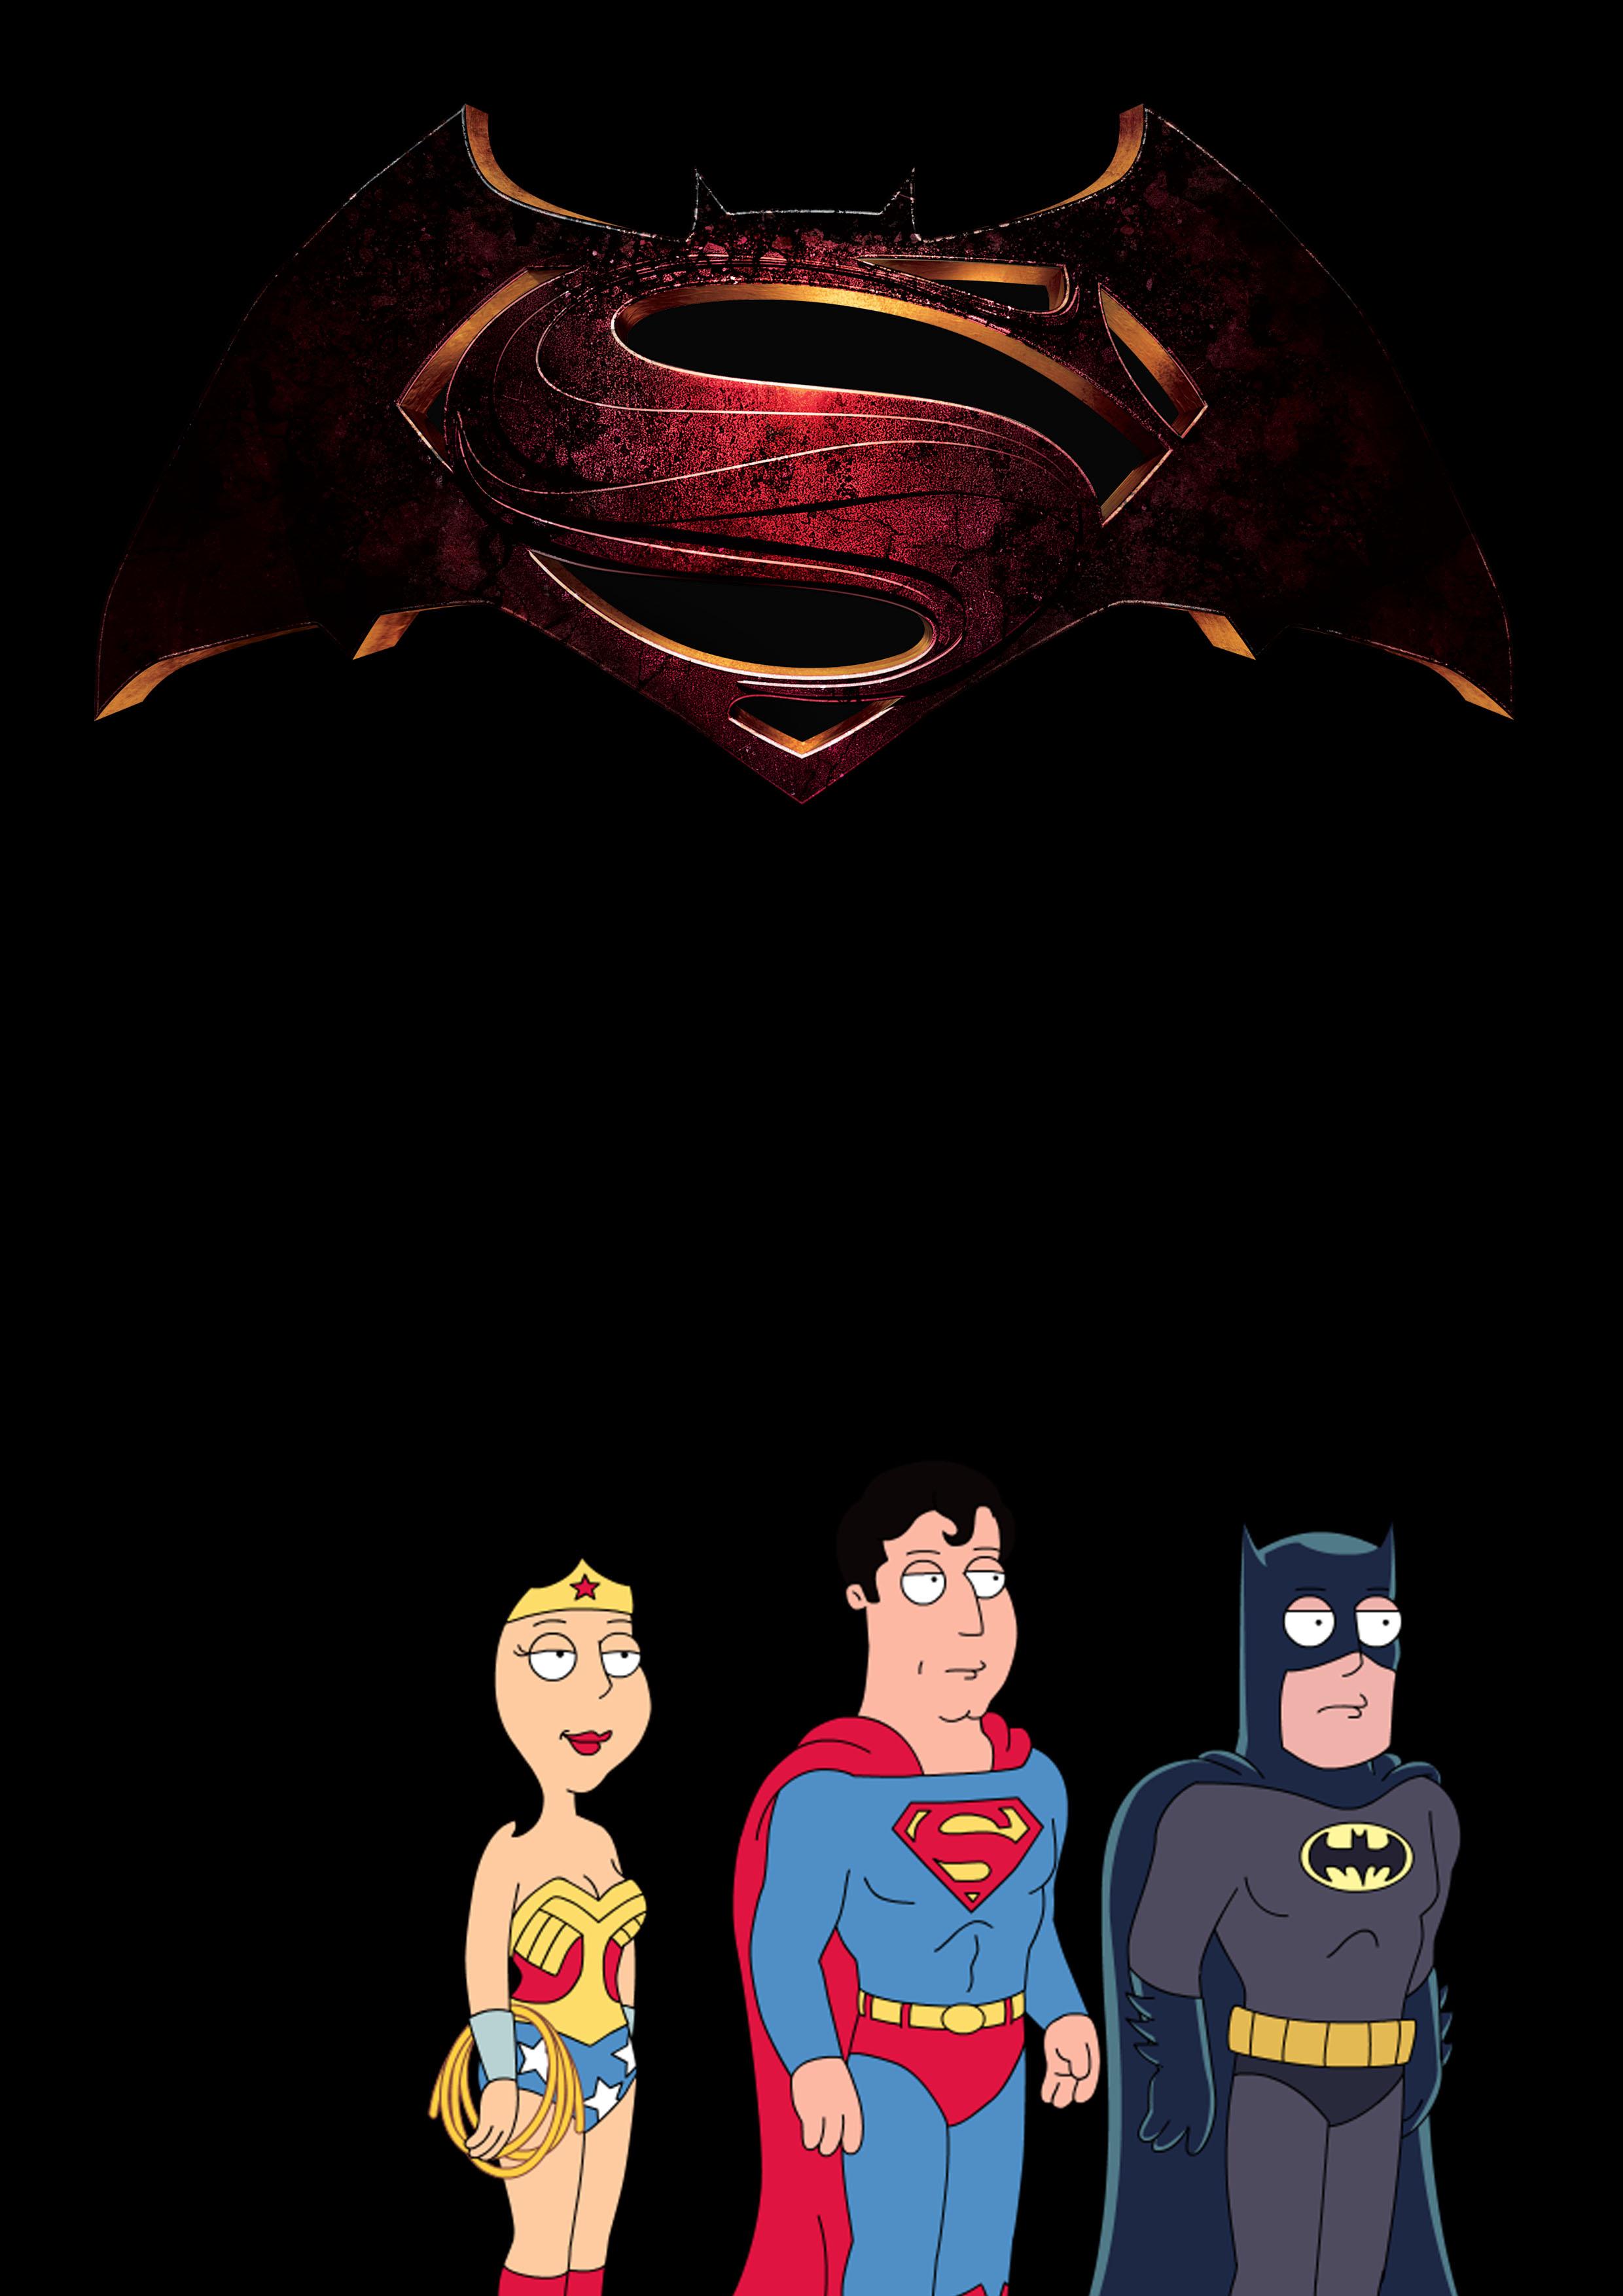 family guy images batman v superman: dawn of justice hd wallpaper